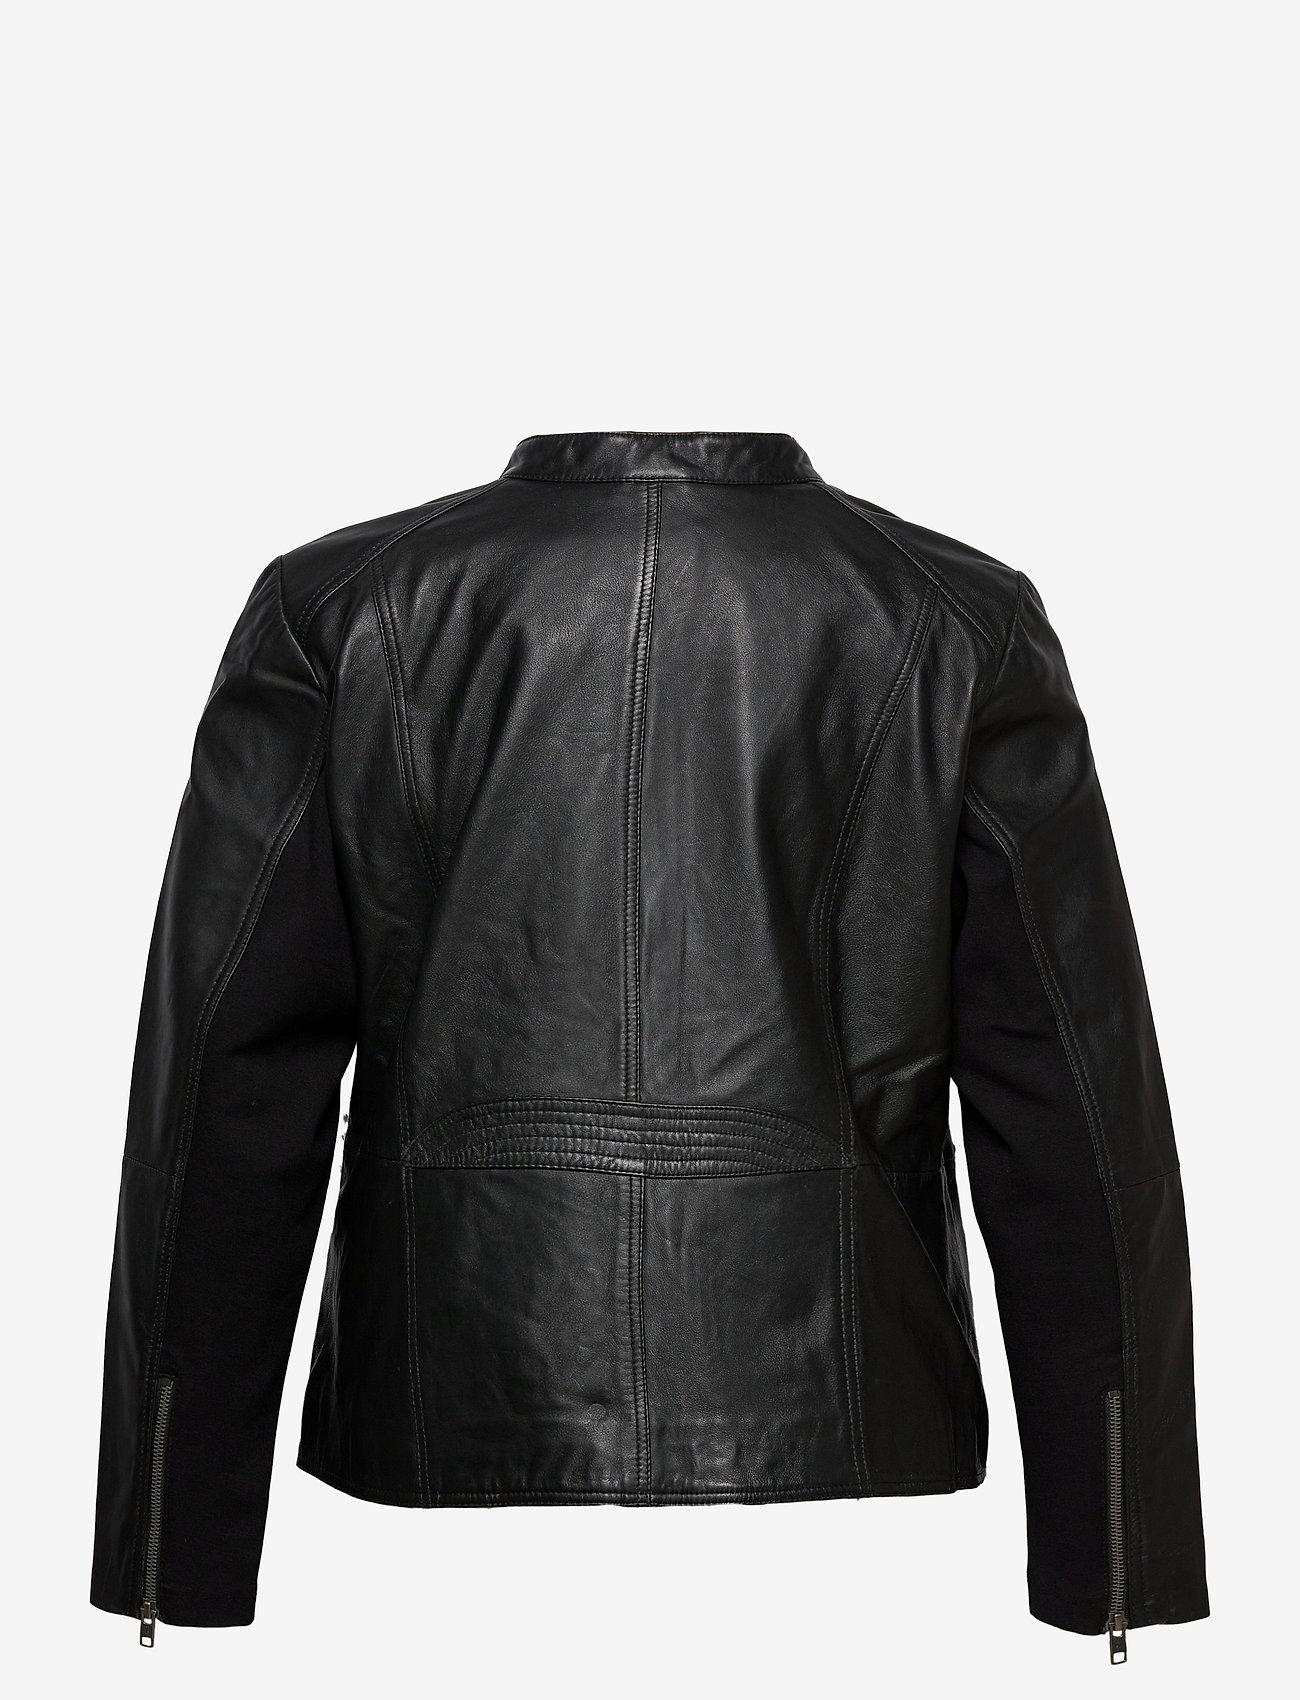 Leather Jacket Plus Size Pockets Zip Close-fitting (Black) (254.99 €) - Zizzi exhyi